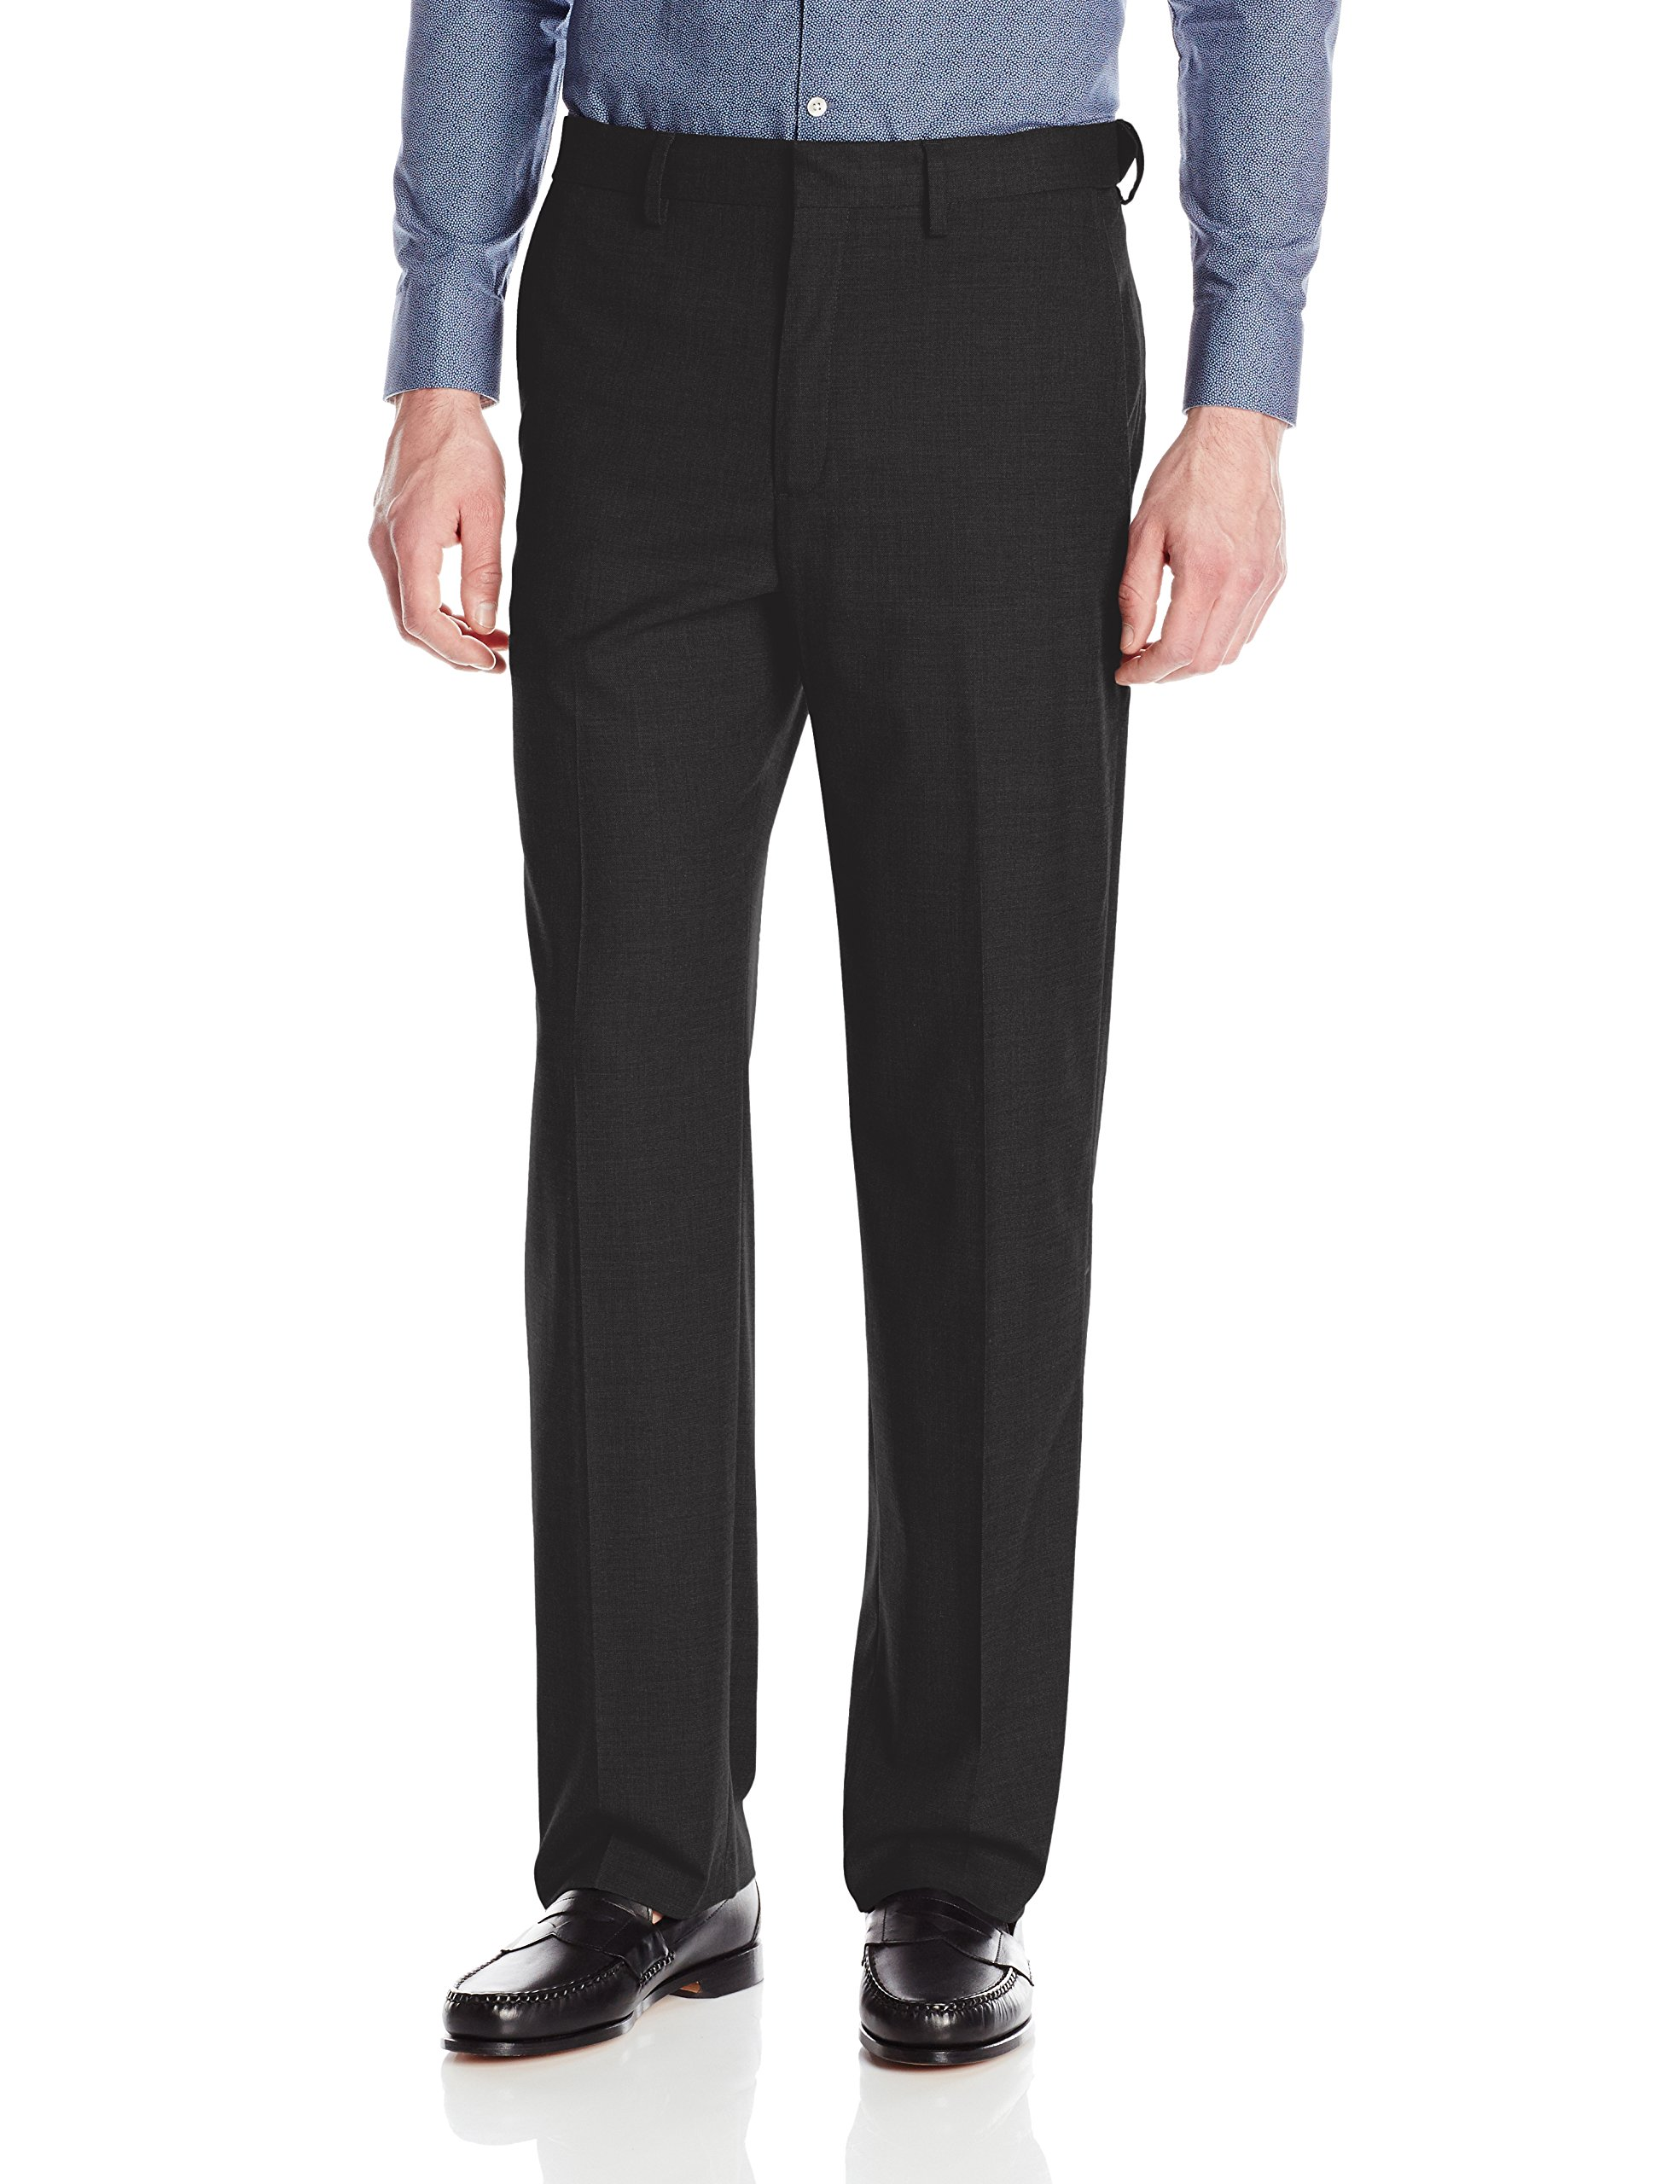 J.M. Haggar Men's Premium Performance Stretch Stria Plain Front Suit Separate Pant, Black, 44W x 30L by J.M. Haggar